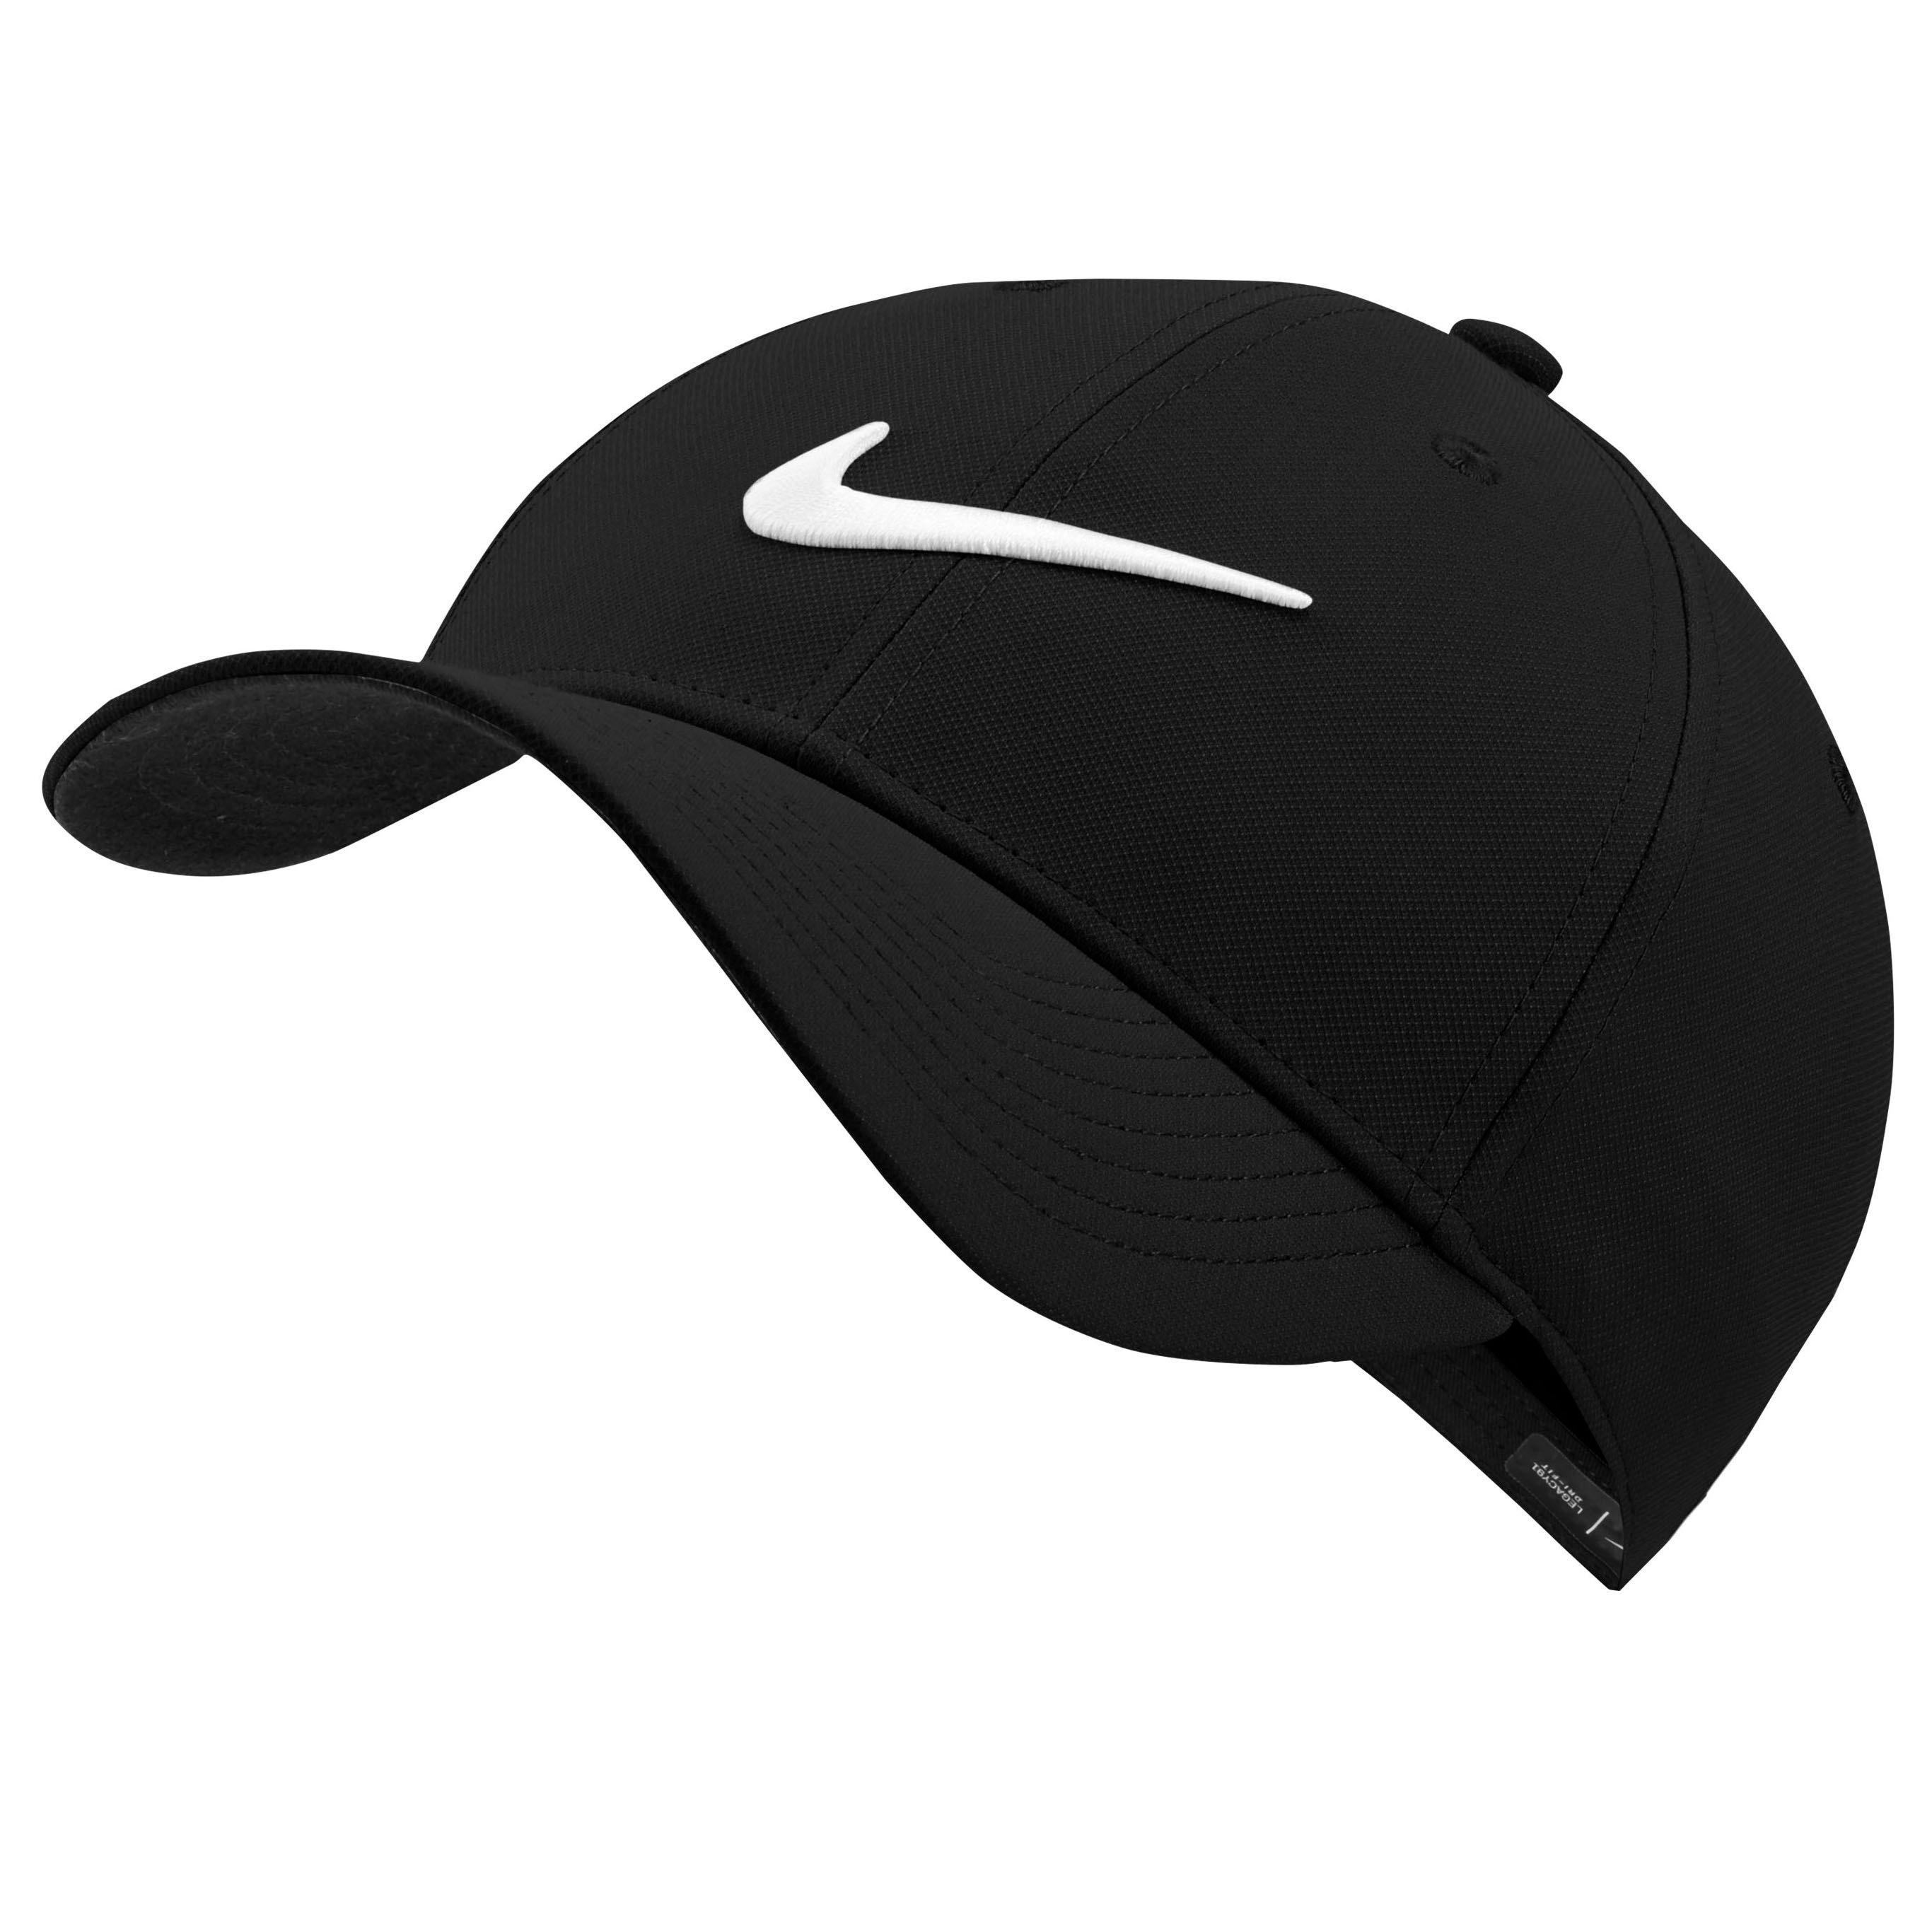 Nike baseballcap DRI-FIT LEGACY91 ADJUSTABLE TRAINING voordelig en veilig online kopen